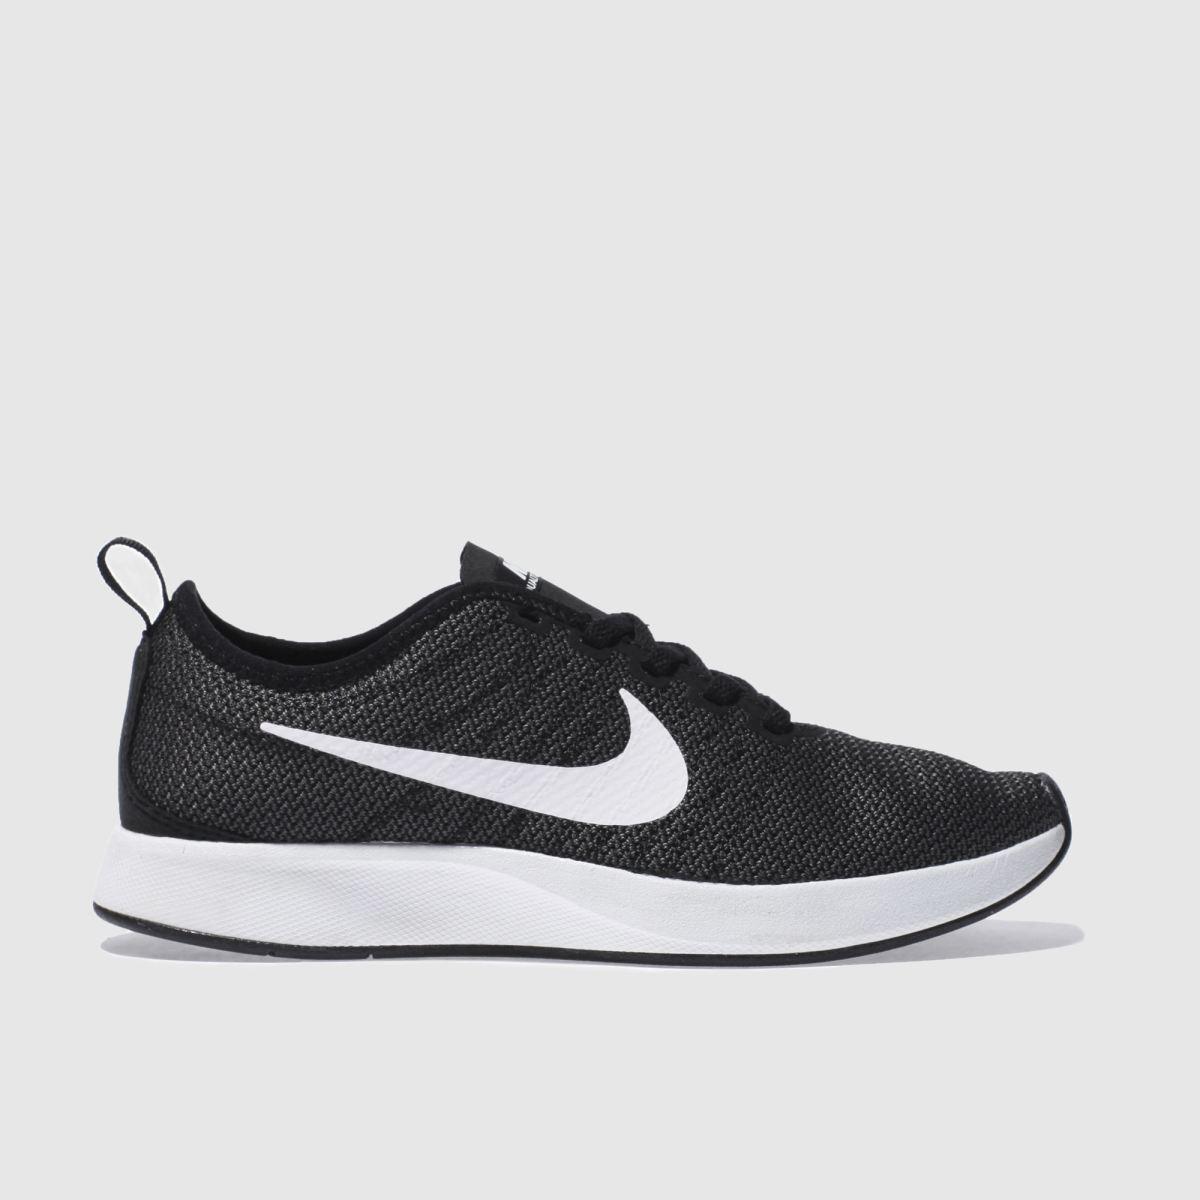 Nike Black & White Dualtone Racer Trainers